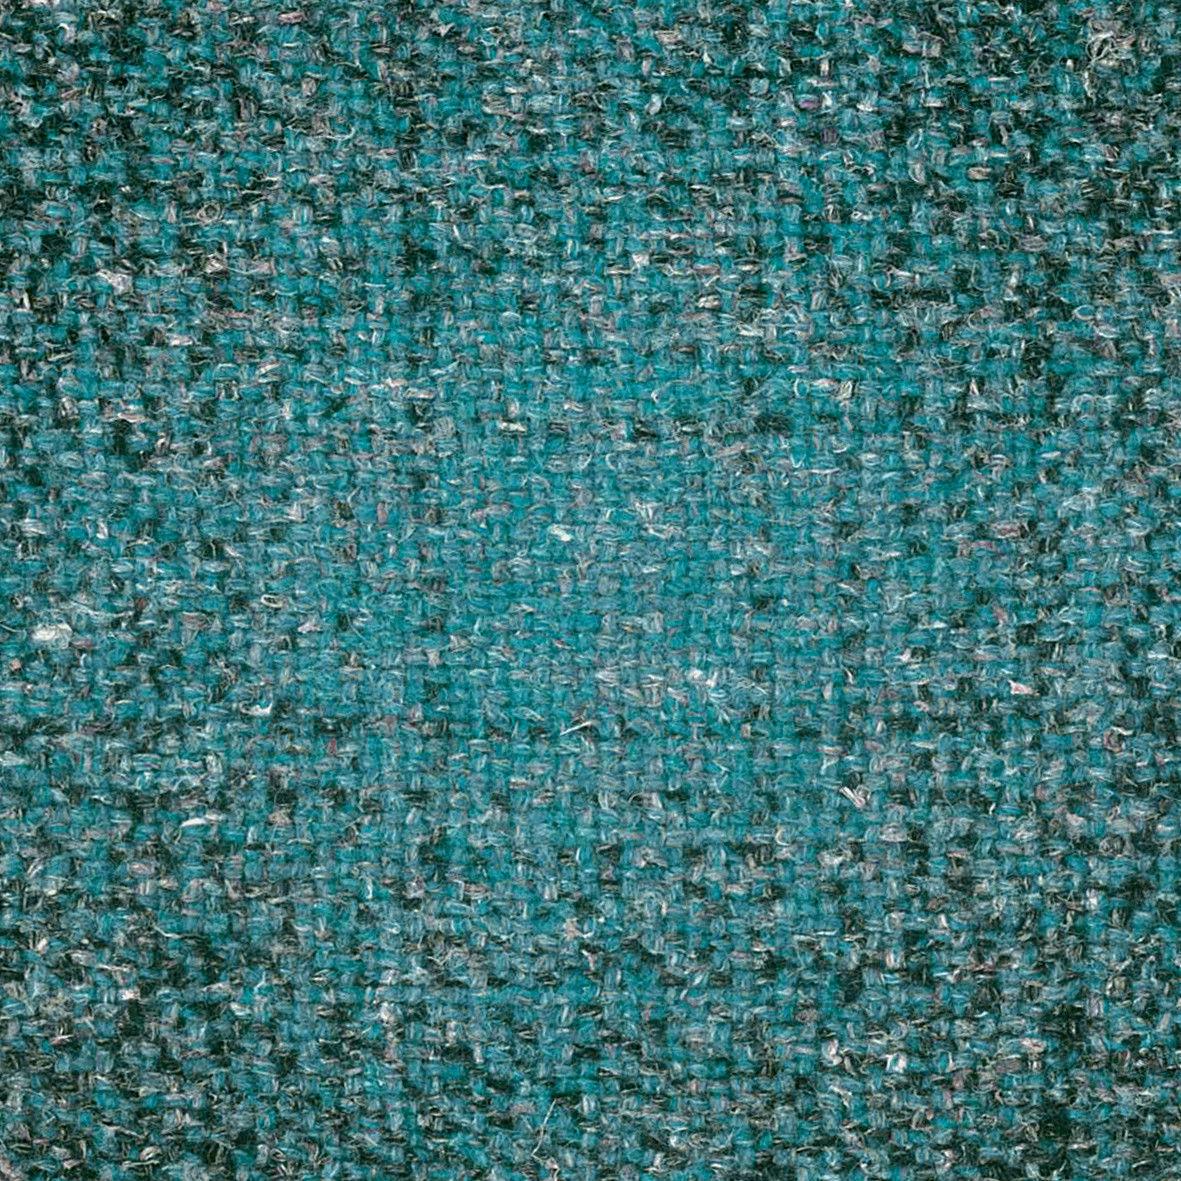 3 yds Camira Upholstery Fabric Hebden Hemp Wool Hornby Blue plaid HWC20 NV